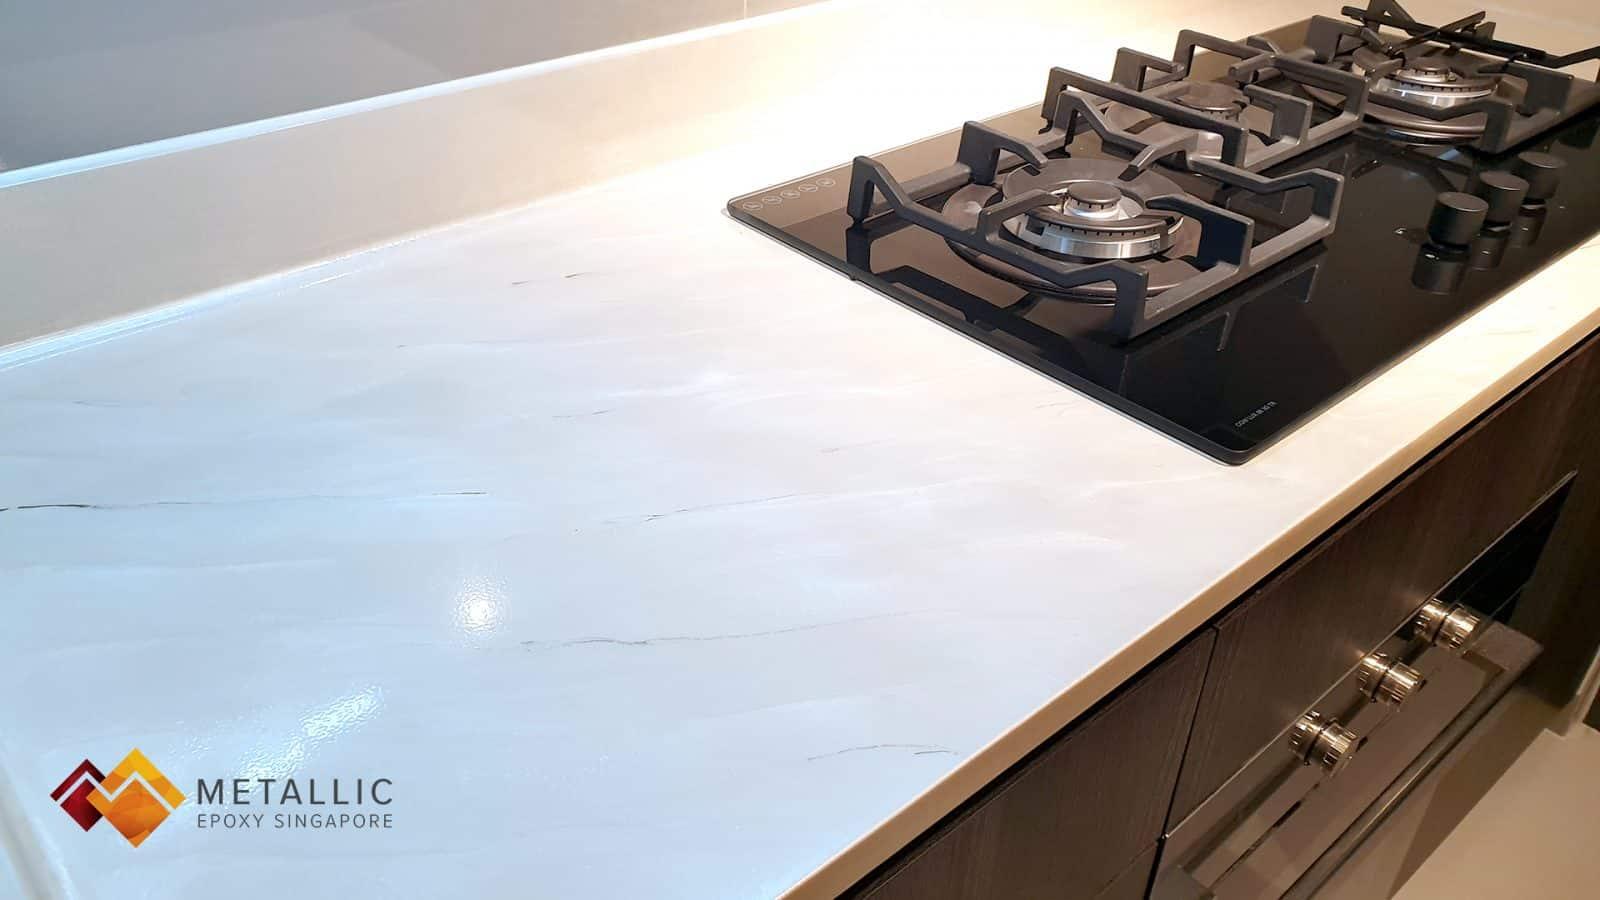 Metallic Epoxy Singapore Cannoli Cream Marble Countertop